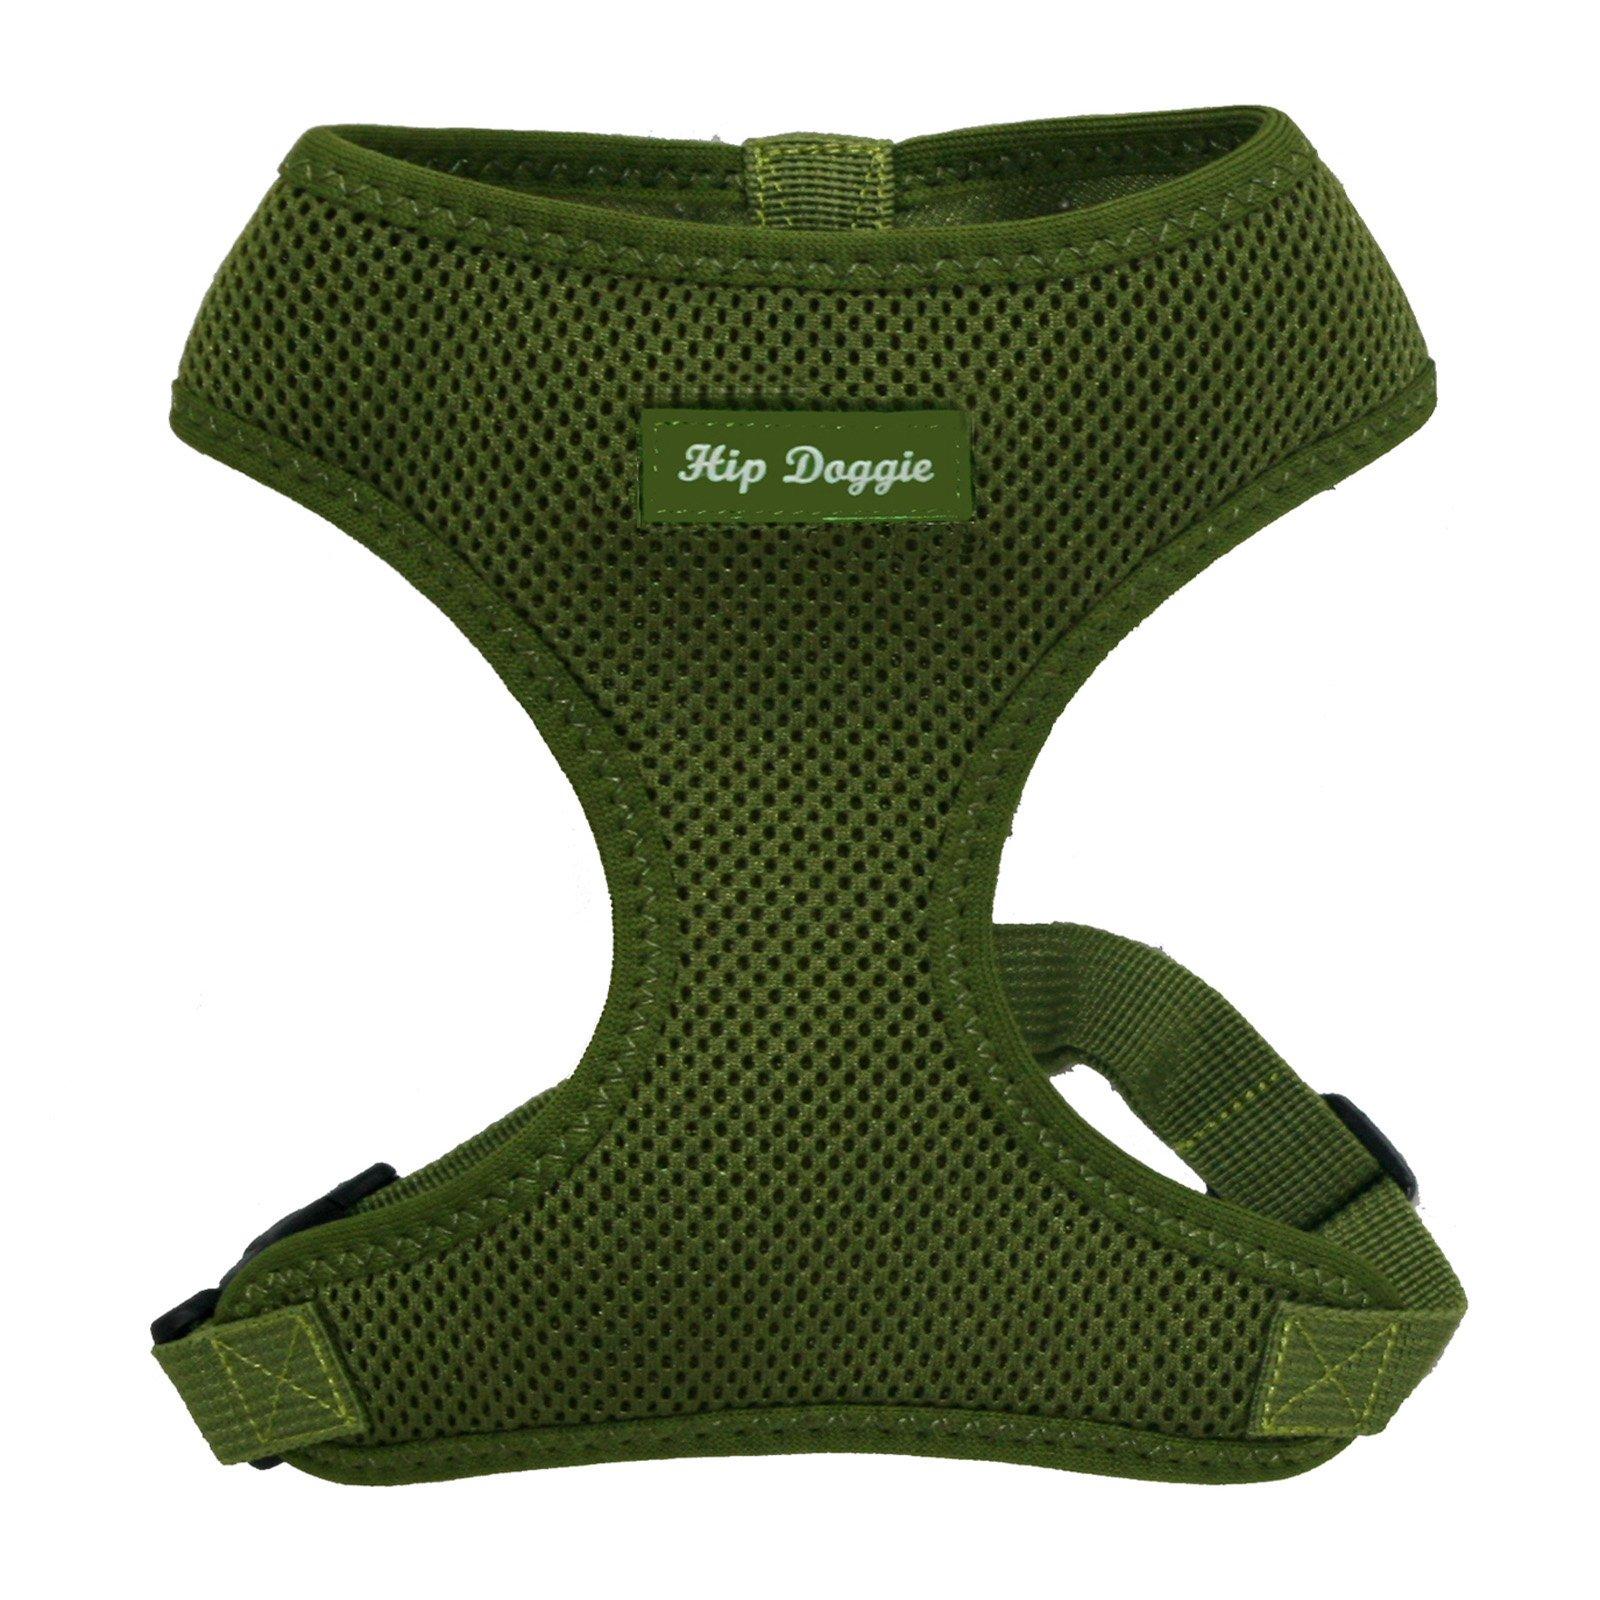 Hip Doggie Ultra Comfort Mesh Dog Harness Vest in Olive Green